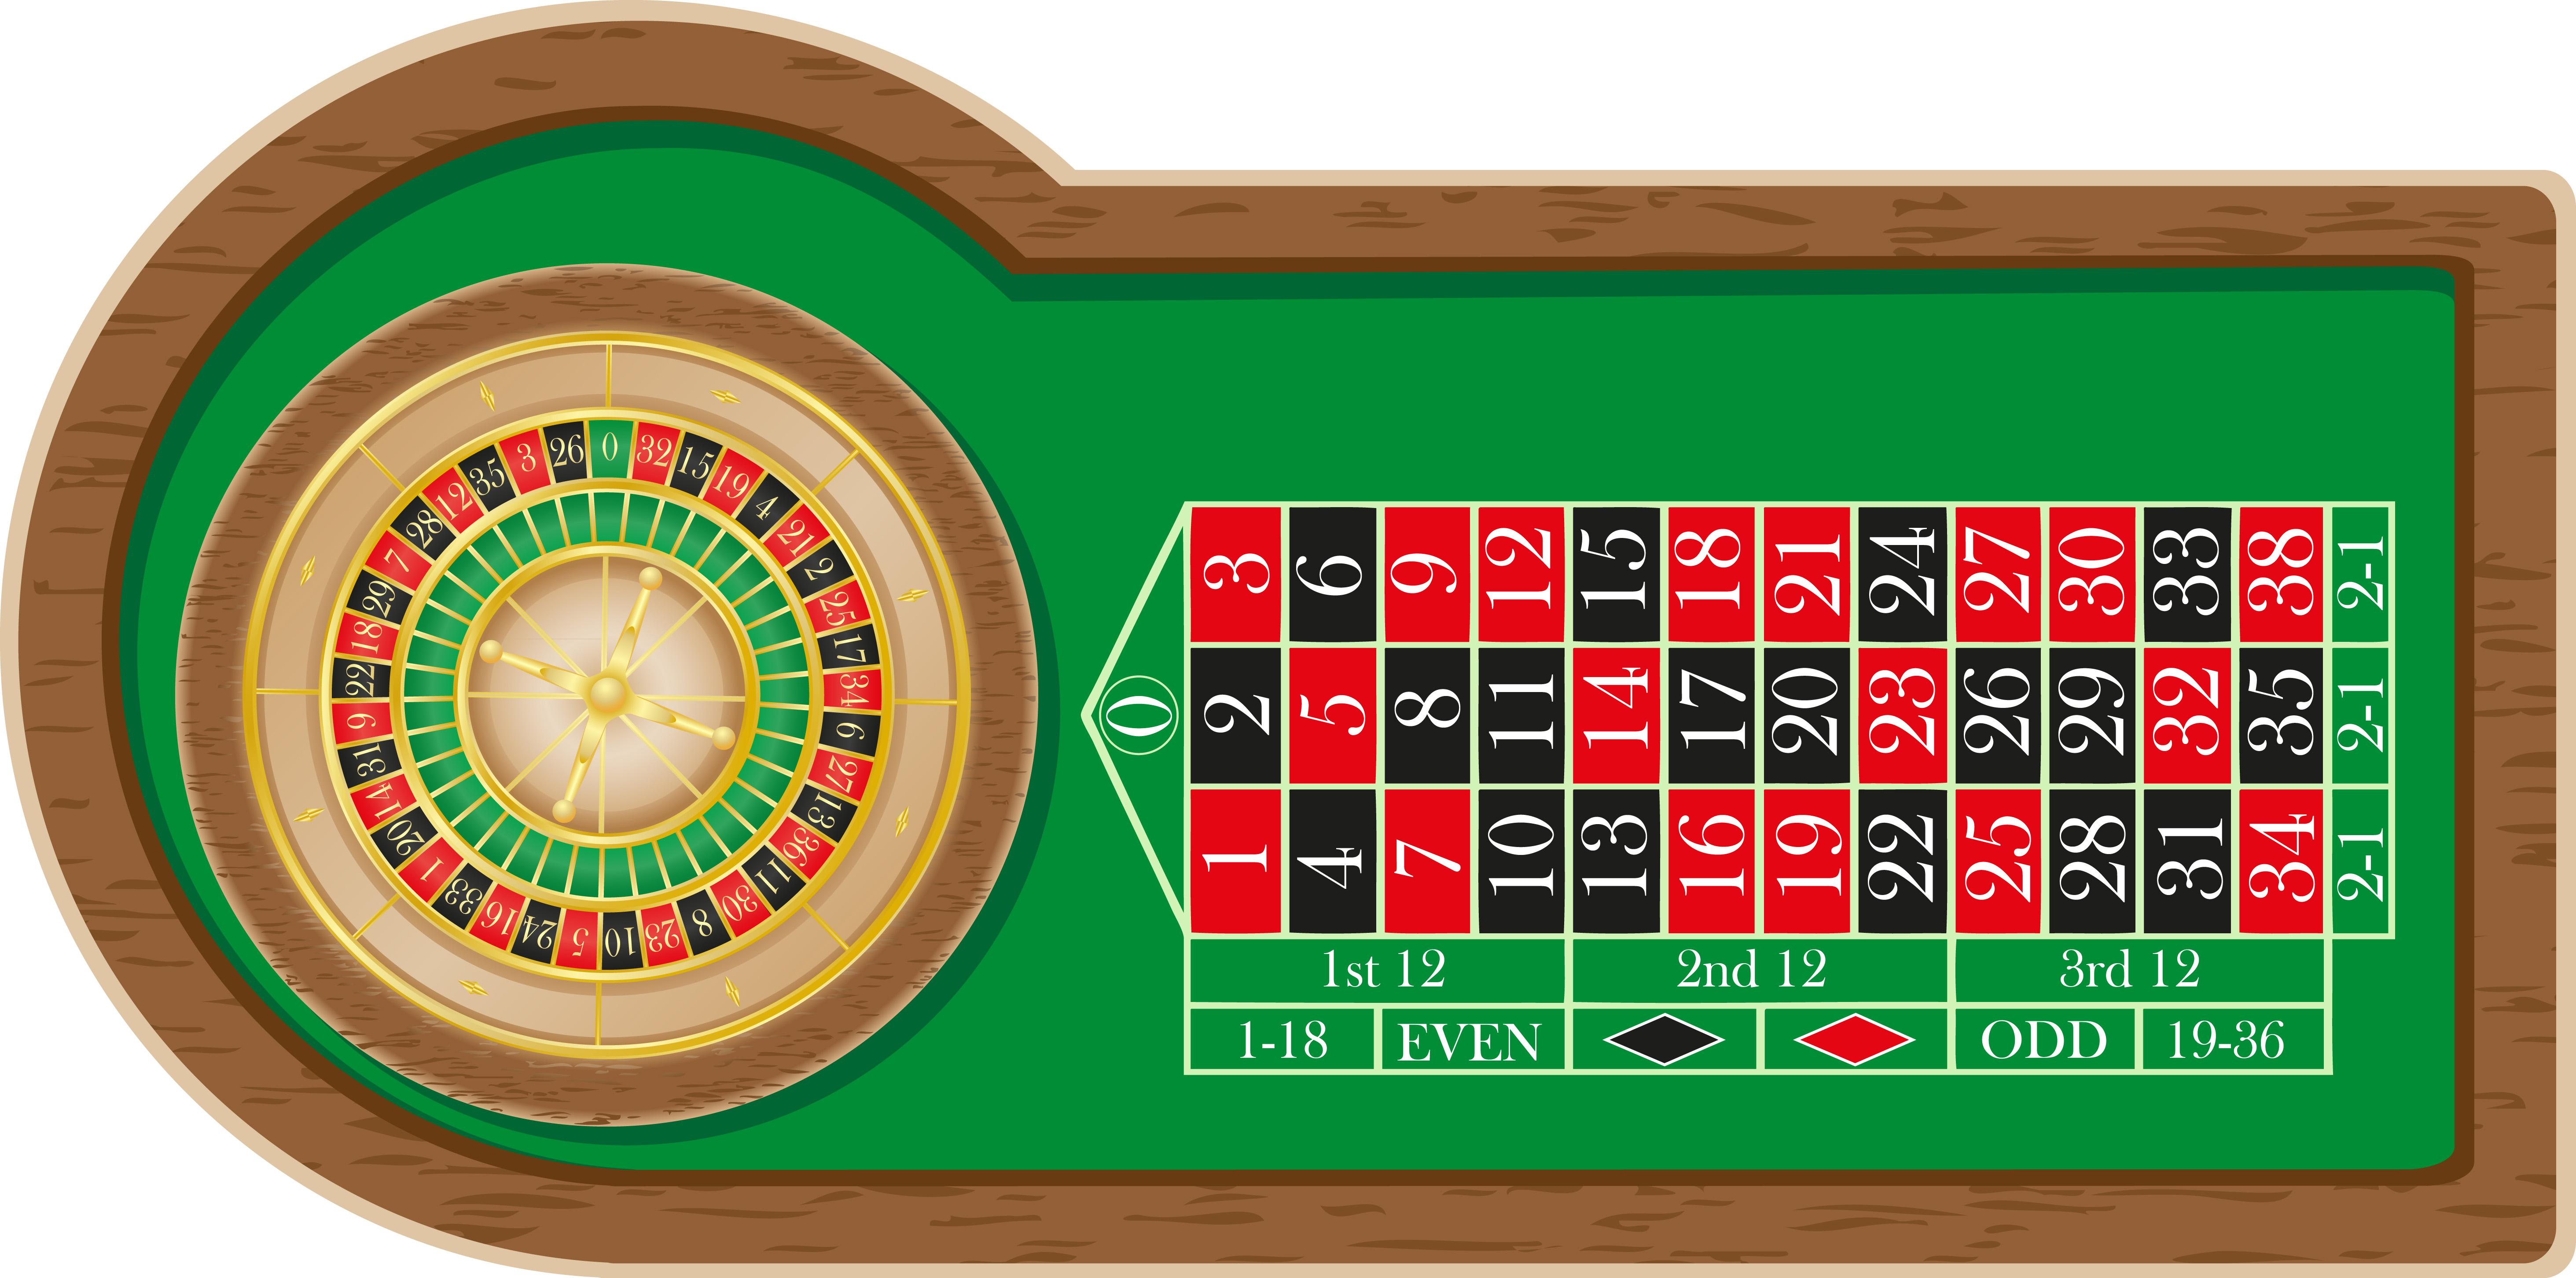 Raging Bull Casino | $50 No Deposit Bonus for New Players!